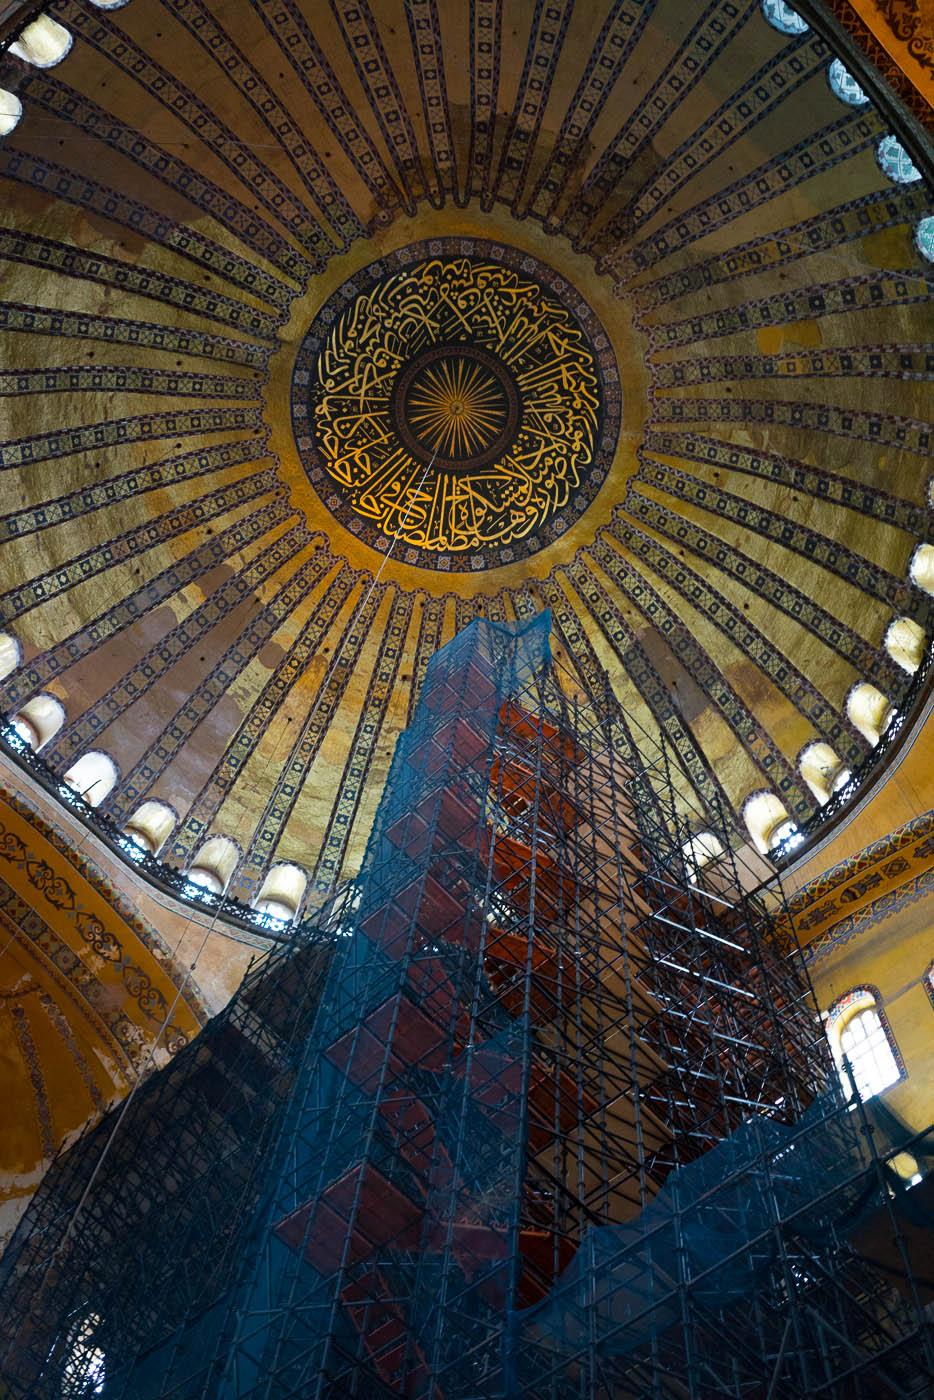 Scaffoldings inside Haya Sofia mosque